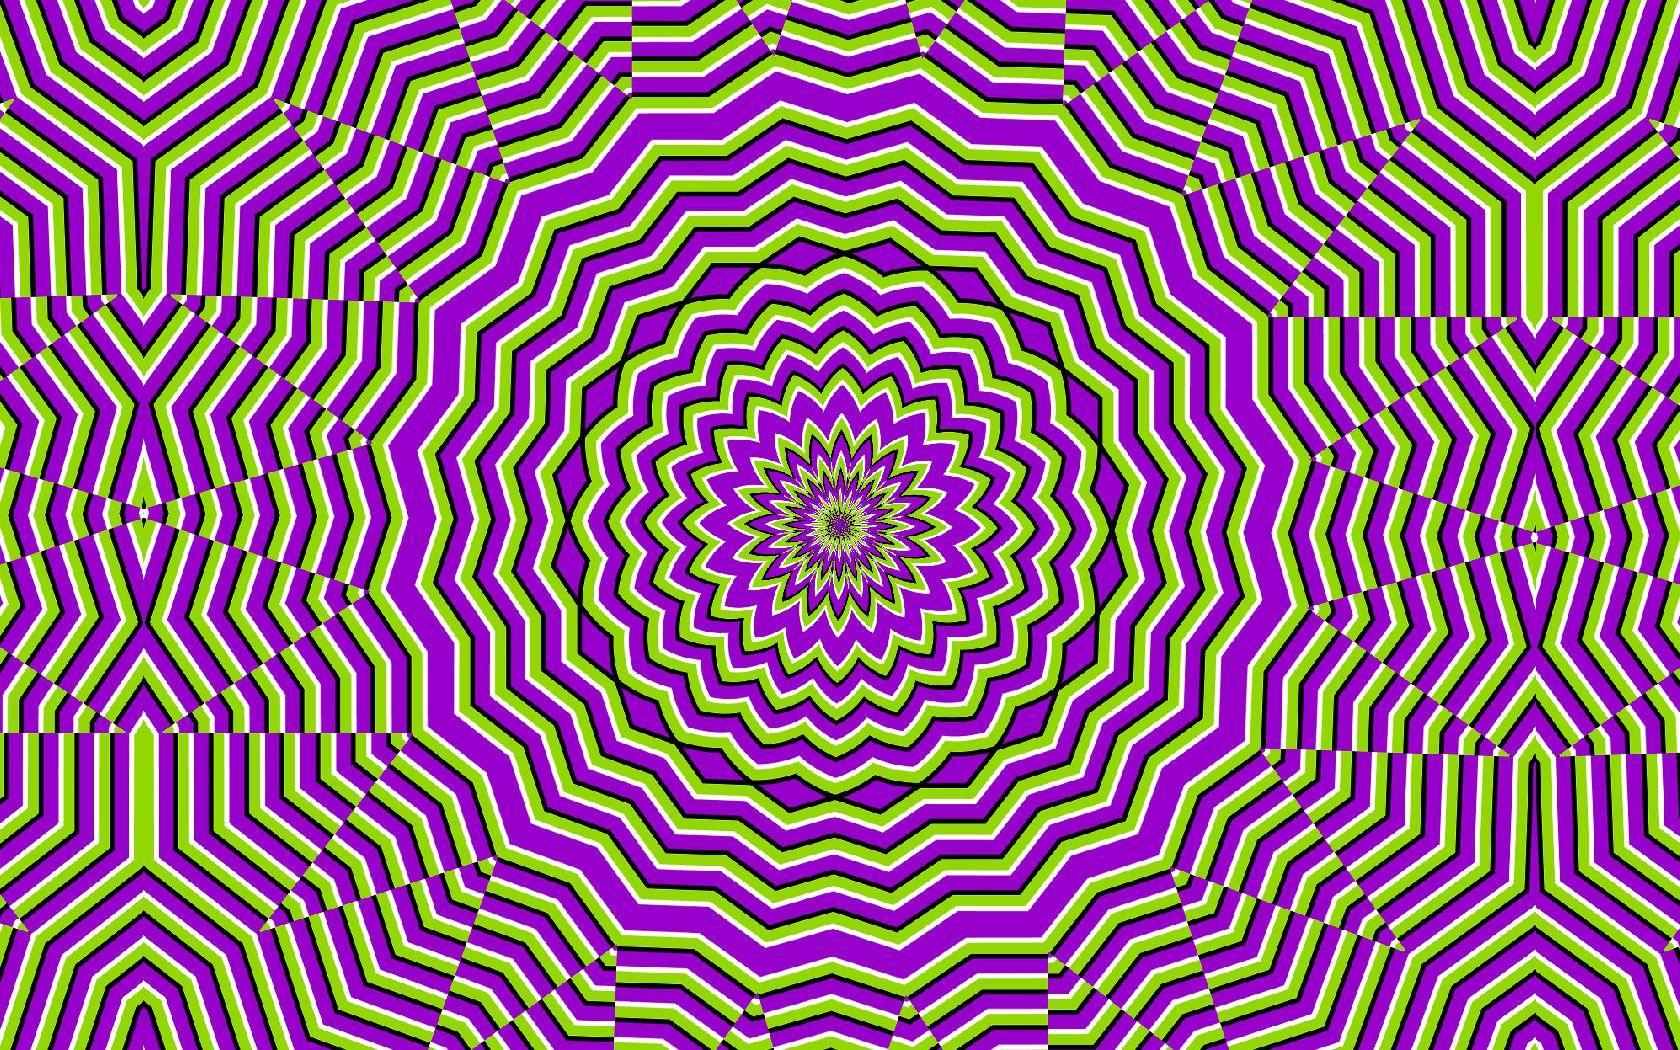 Mind Teaser Teasers Moving Optical Illusion Purple Optical